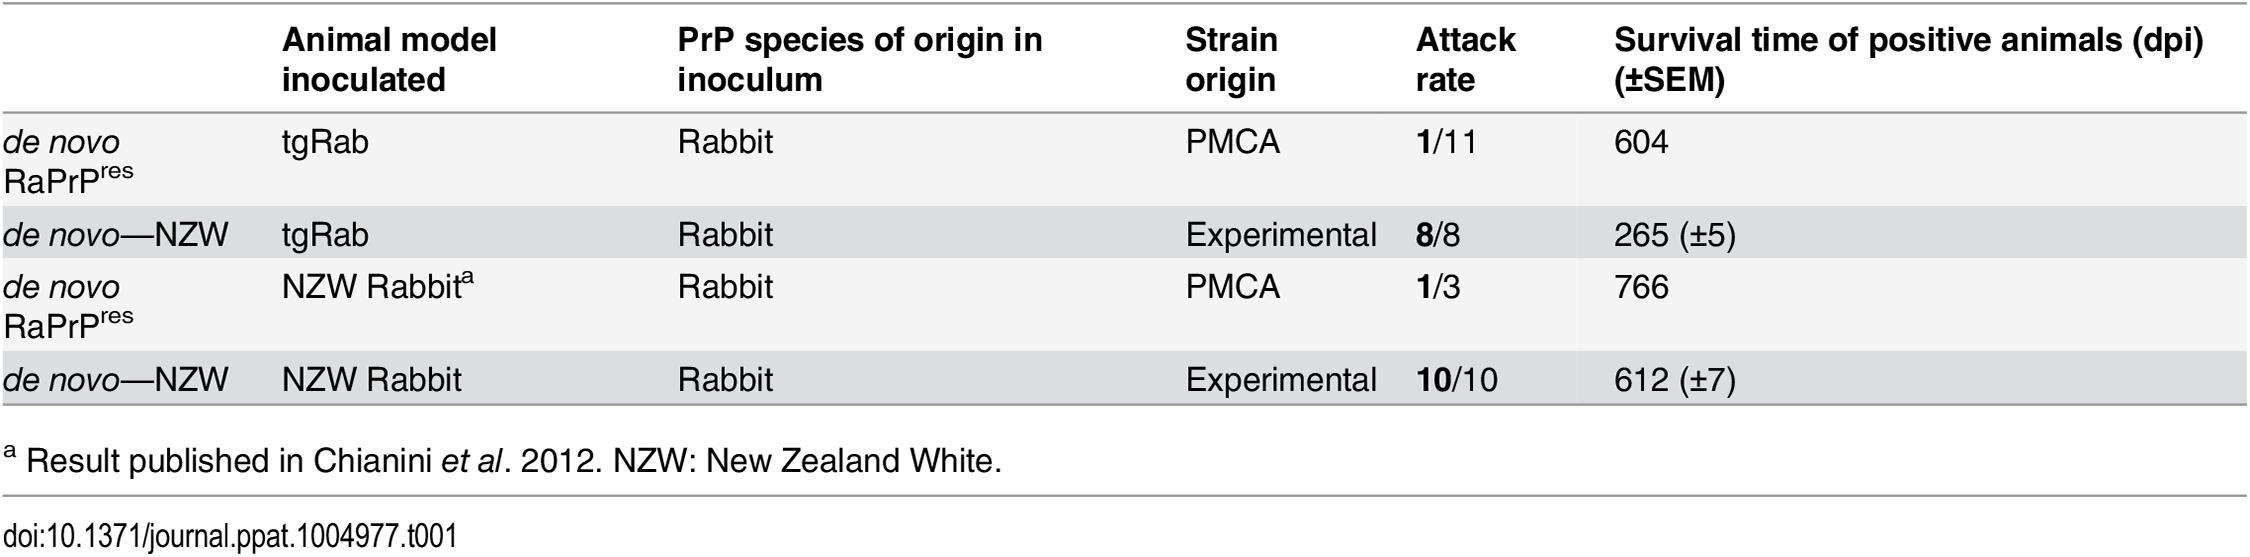 Comparison of TgRab mice and actual rabbit bioassays.